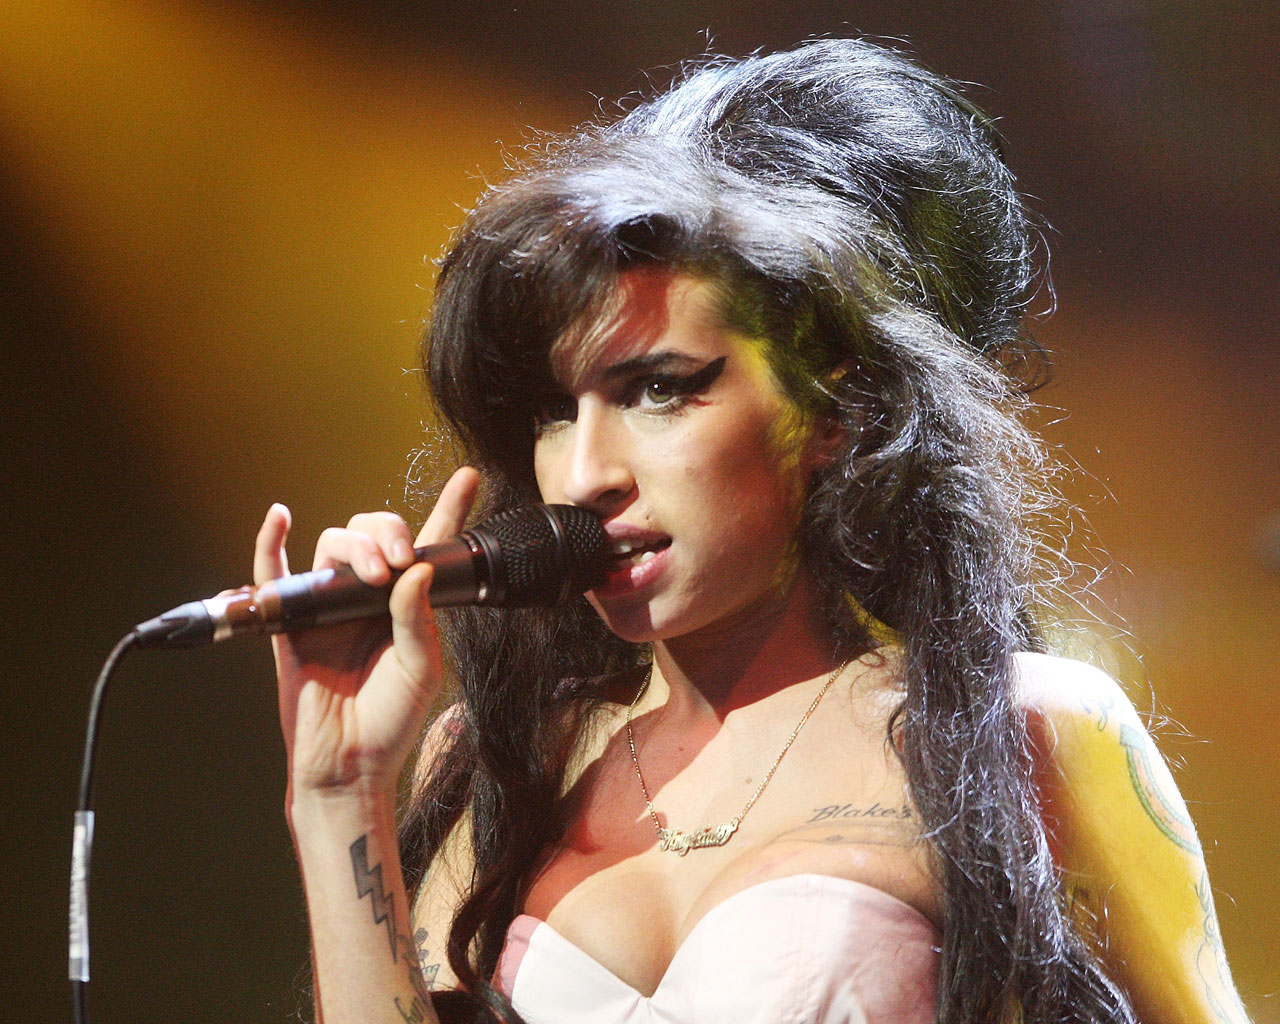 http://4.bp.blogspot.com/_csogD6ptEnI/SwD5hhIfq1I/AAAAAAAADhU/0YR1R8yit1Y/s1600/Amy_Winehouse_08.jpg